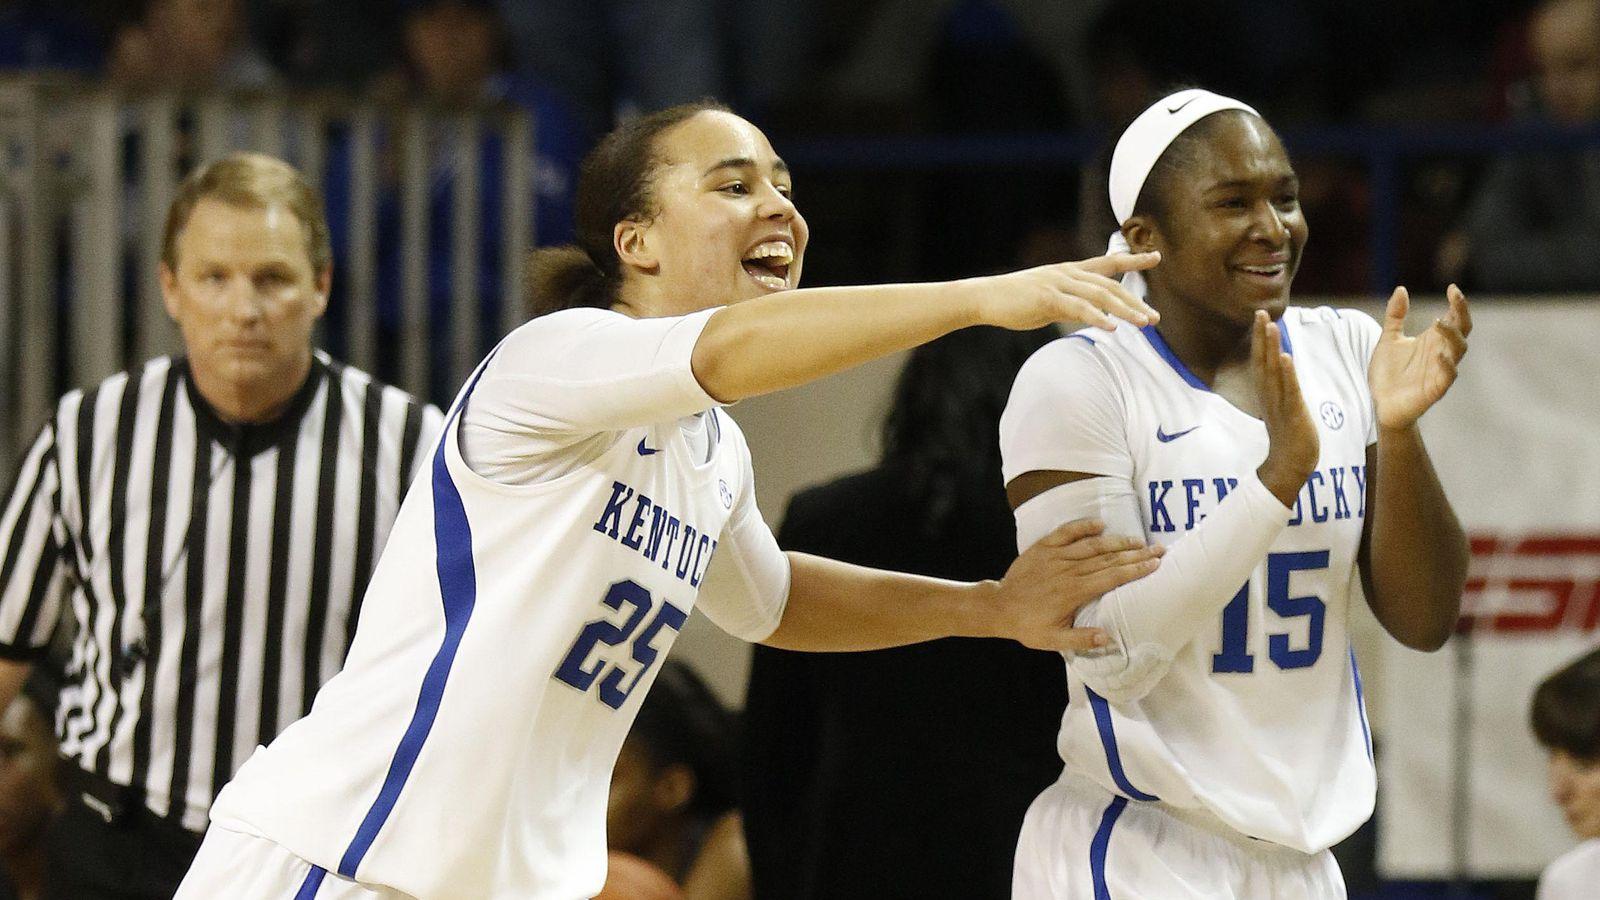 Kentucky Wildcats Basketball Full 2015 16 Schedule: Kentucky Women's Basketball Announces 2015-16 Non